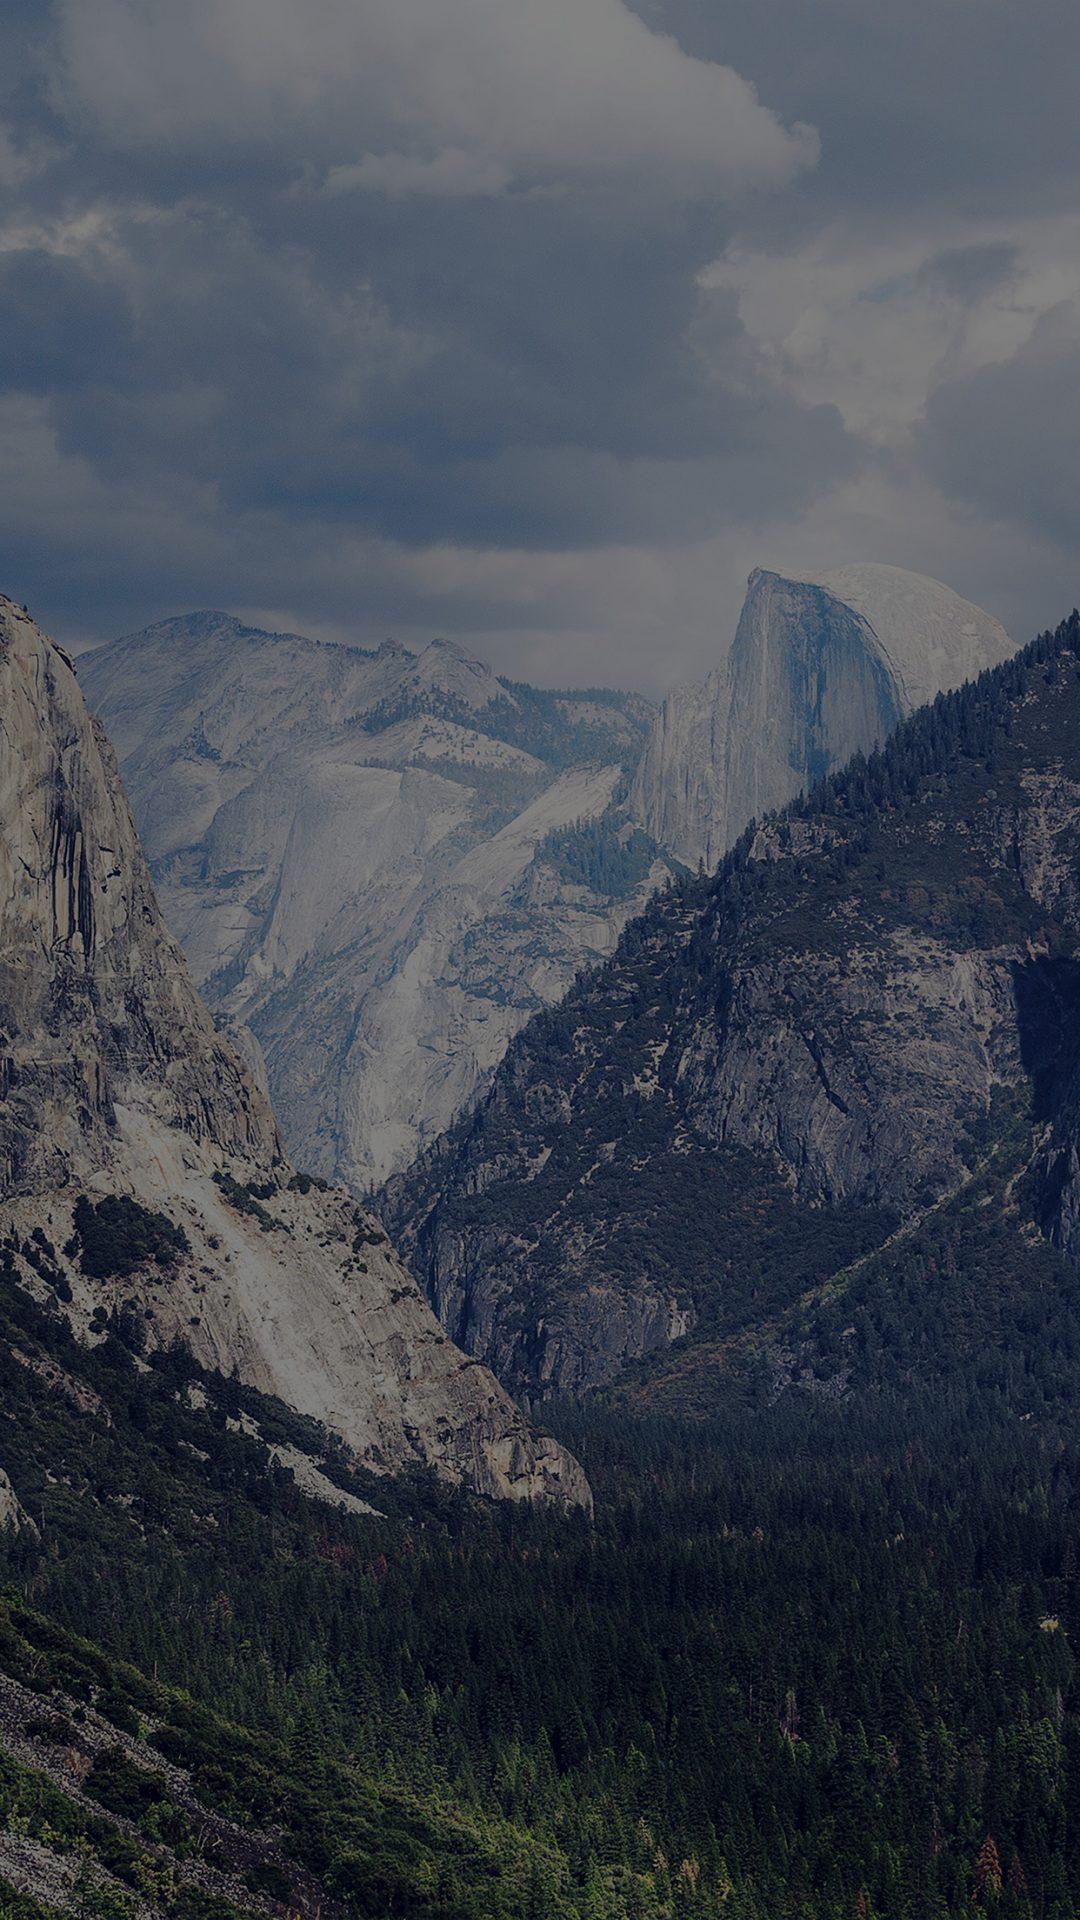 Yosemite Mountain Nature Rock Sky Forest Cloud Dark